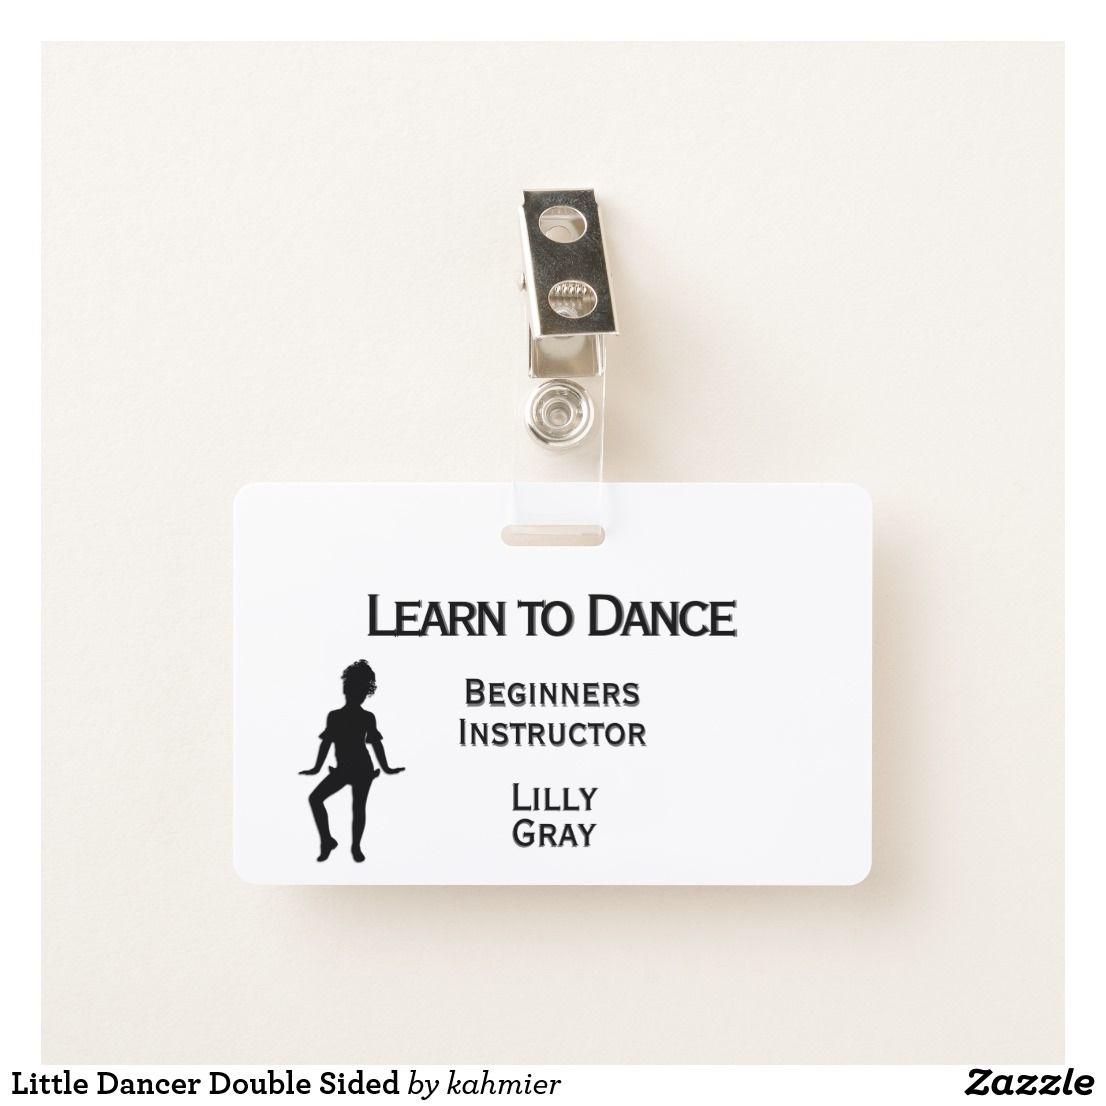 Little Dancer Double Sided Badge